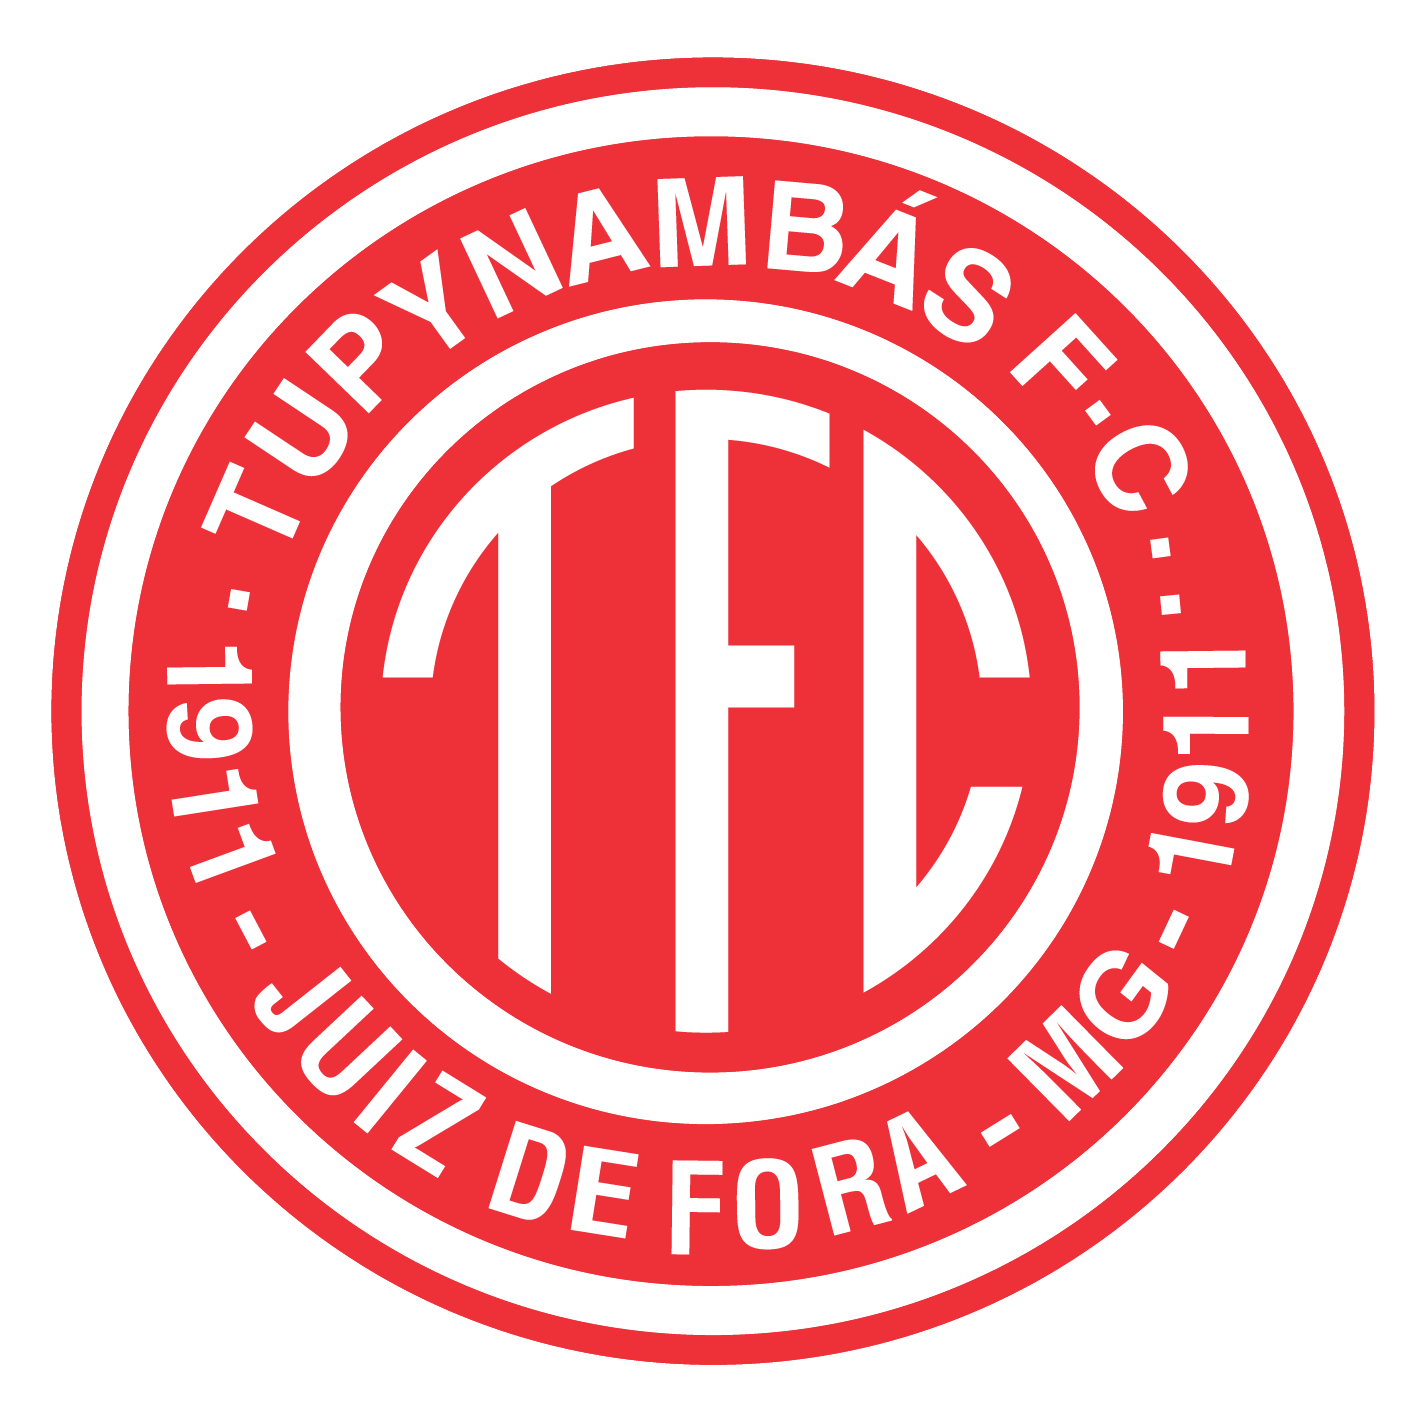 TUPYNAMBAS F.C. 1